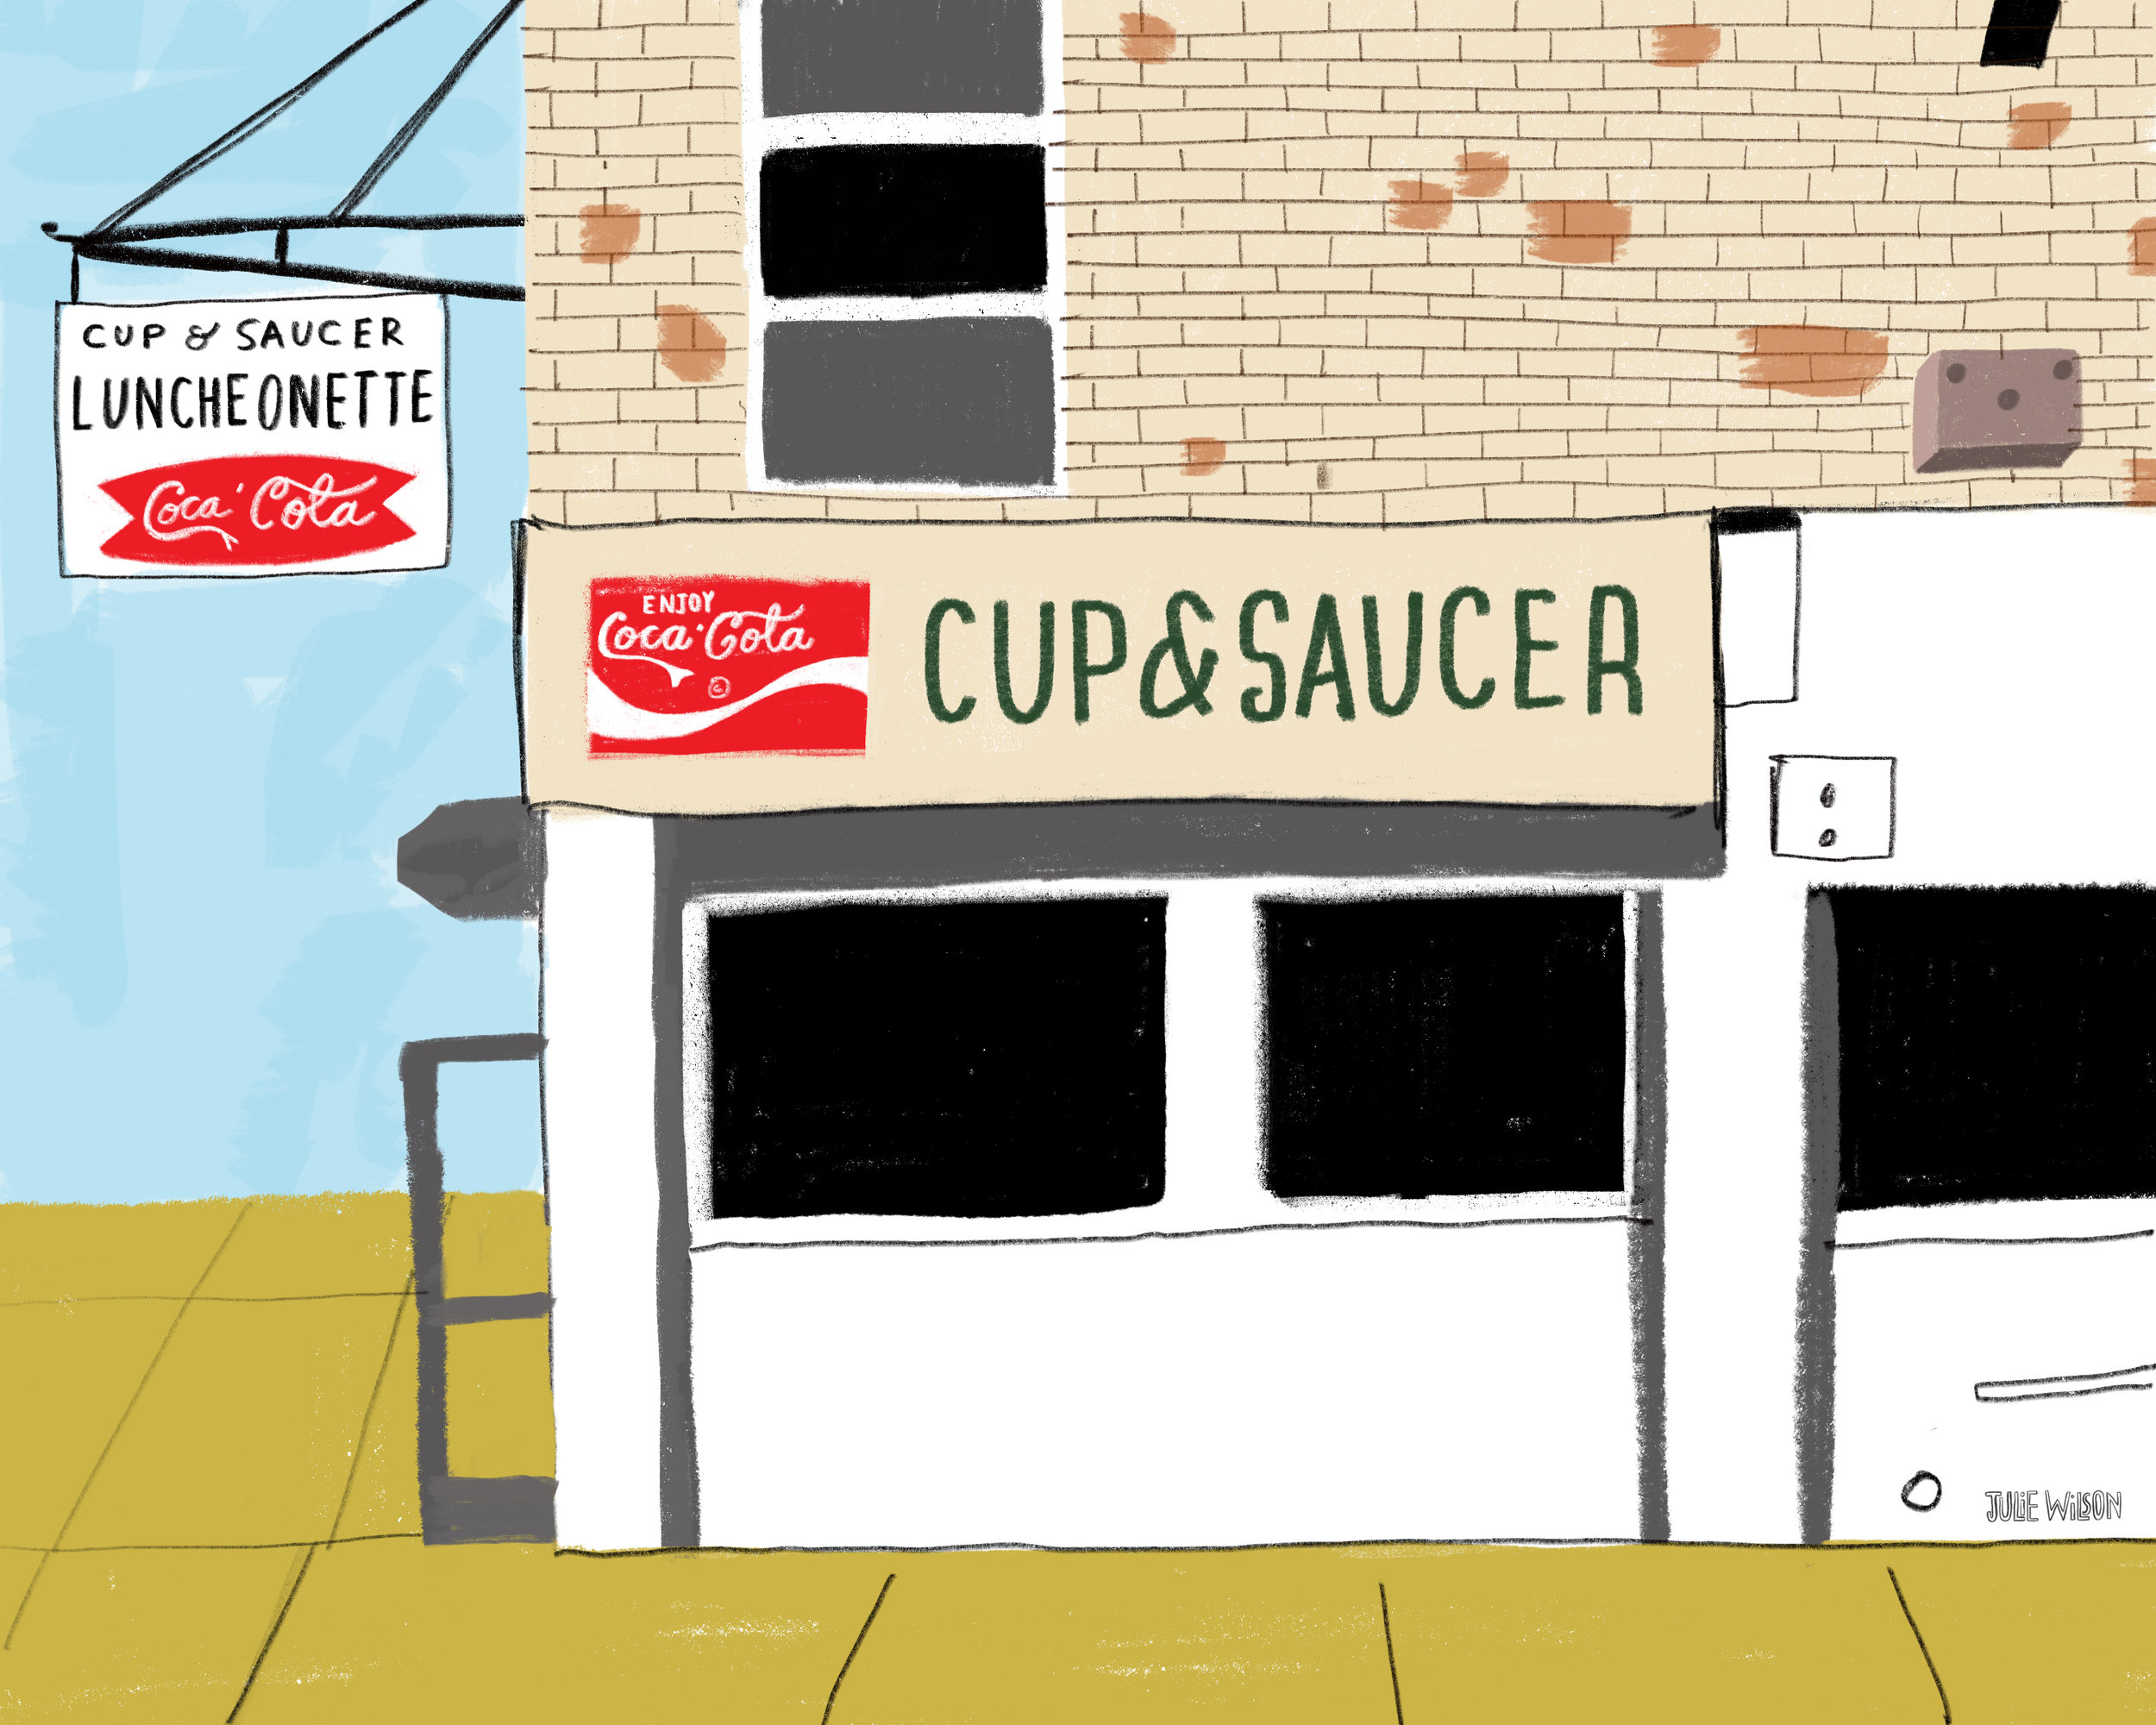 Cup&saucer.jpg